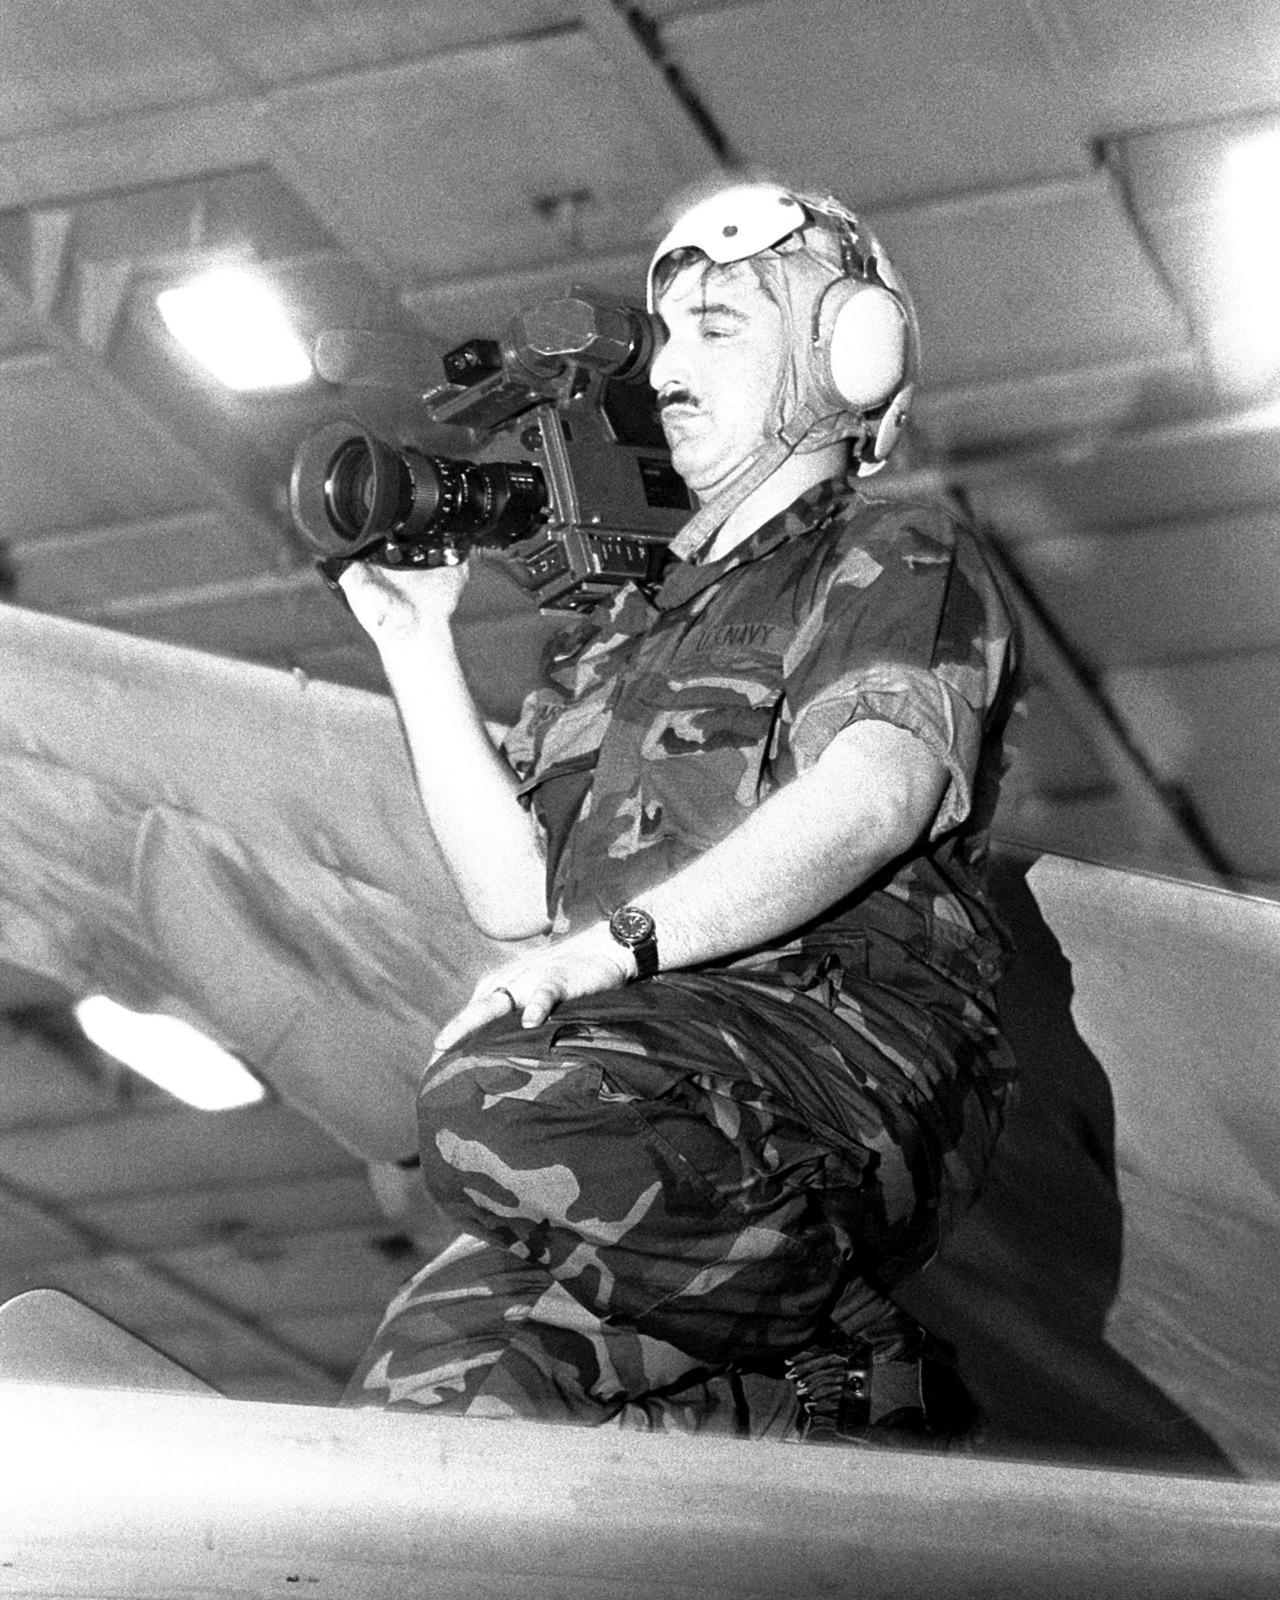 PH2 John Carnes, a member of Fleet Combat Camera Group Atlantic's motion picture crew, films a fire drill from atop an A-6 Intruder aircraft in the hangar bay of the aircraft carrier USS JOHN F. KENNEDY (CV-67) during FLEET EX 1-90